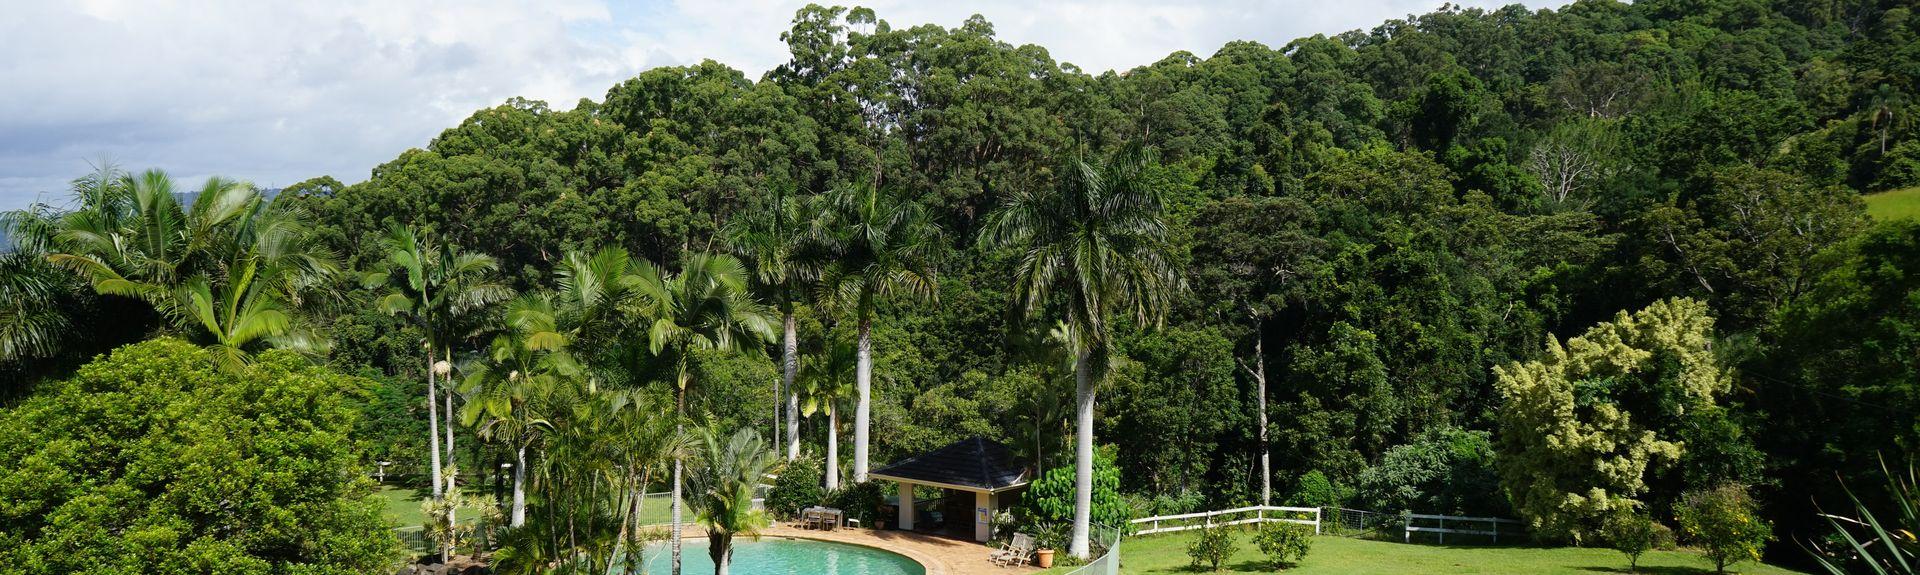 Sippy Downs, Sunshine Coast, Queensland, Australië